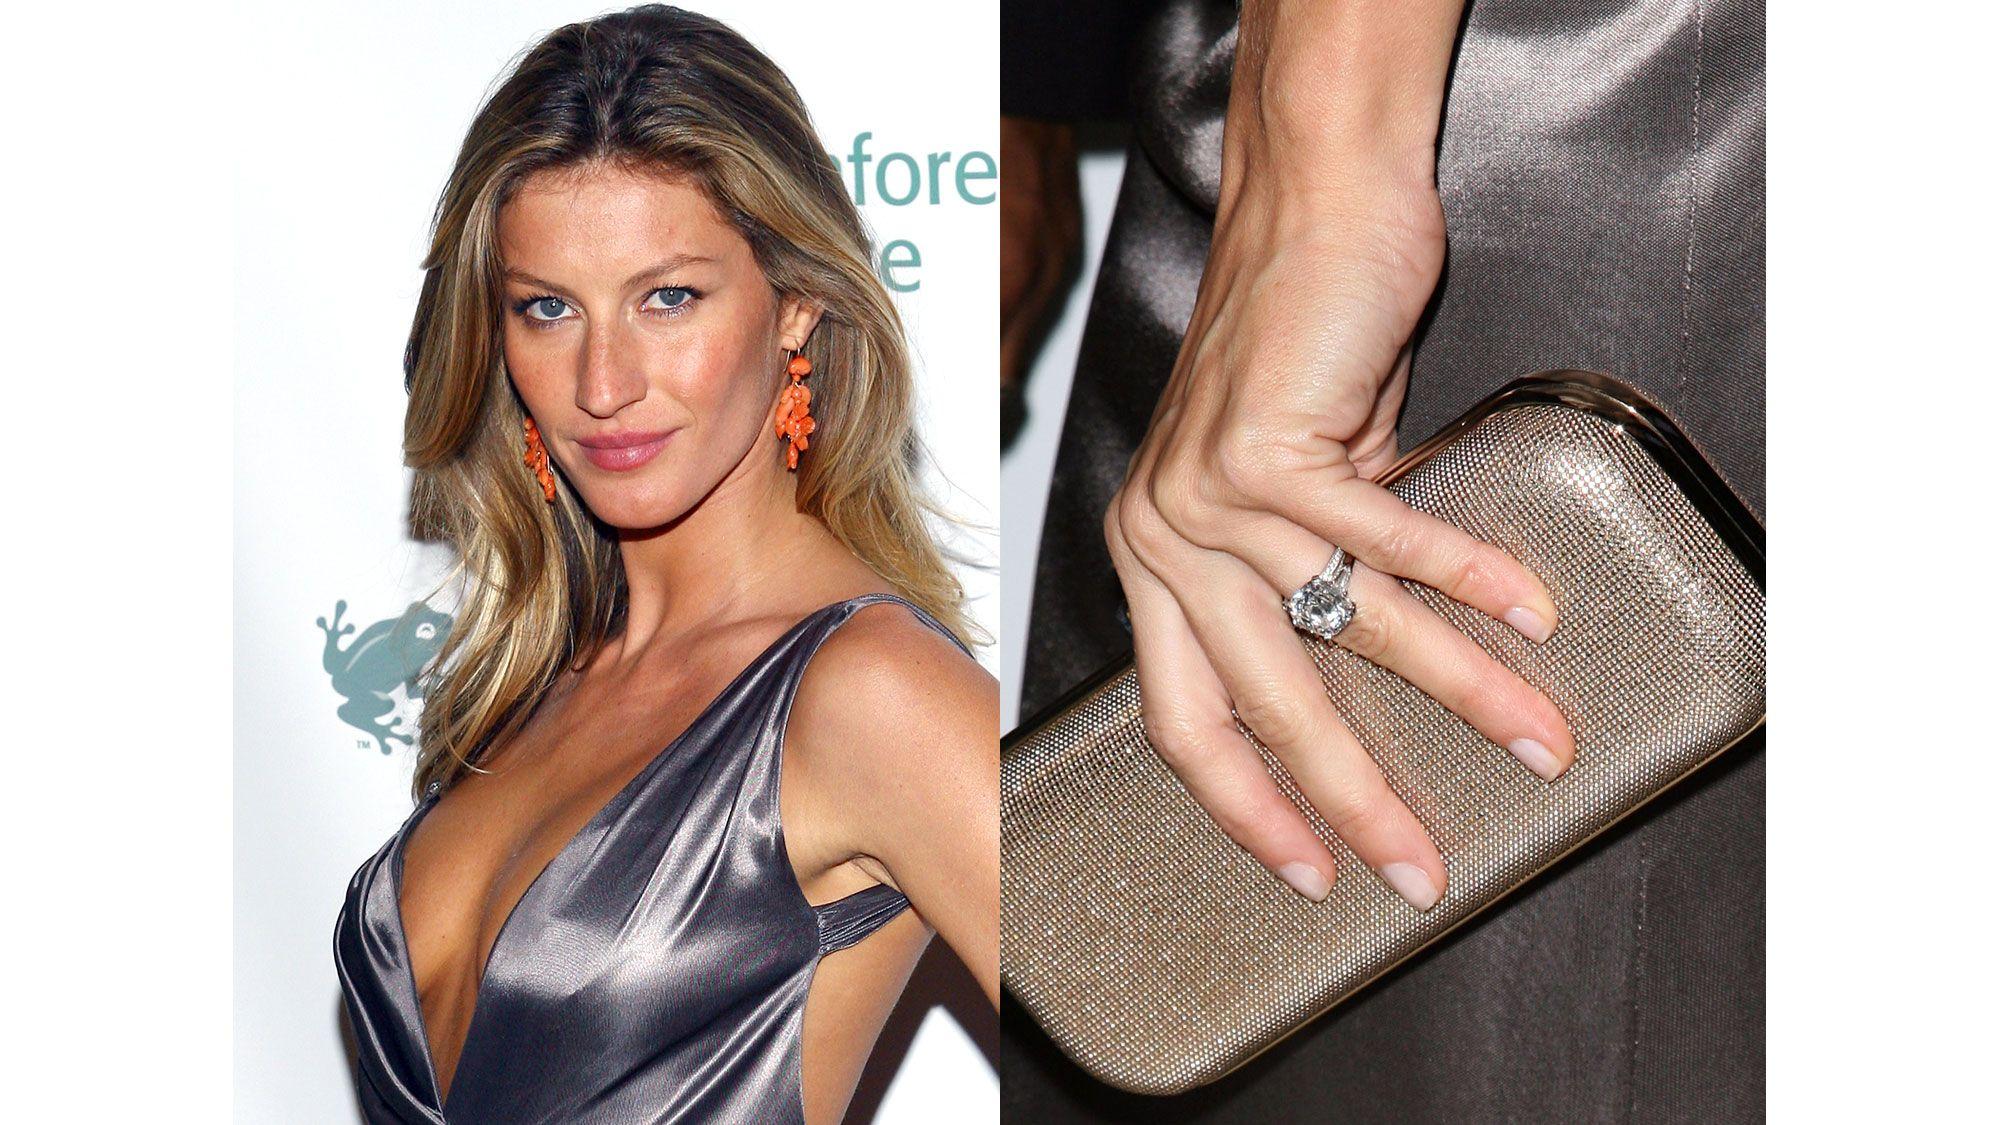 Gisele Bundchen  Tom Brady Gave Gisele A Fourcarat Diamond Solitaire Ring  When They